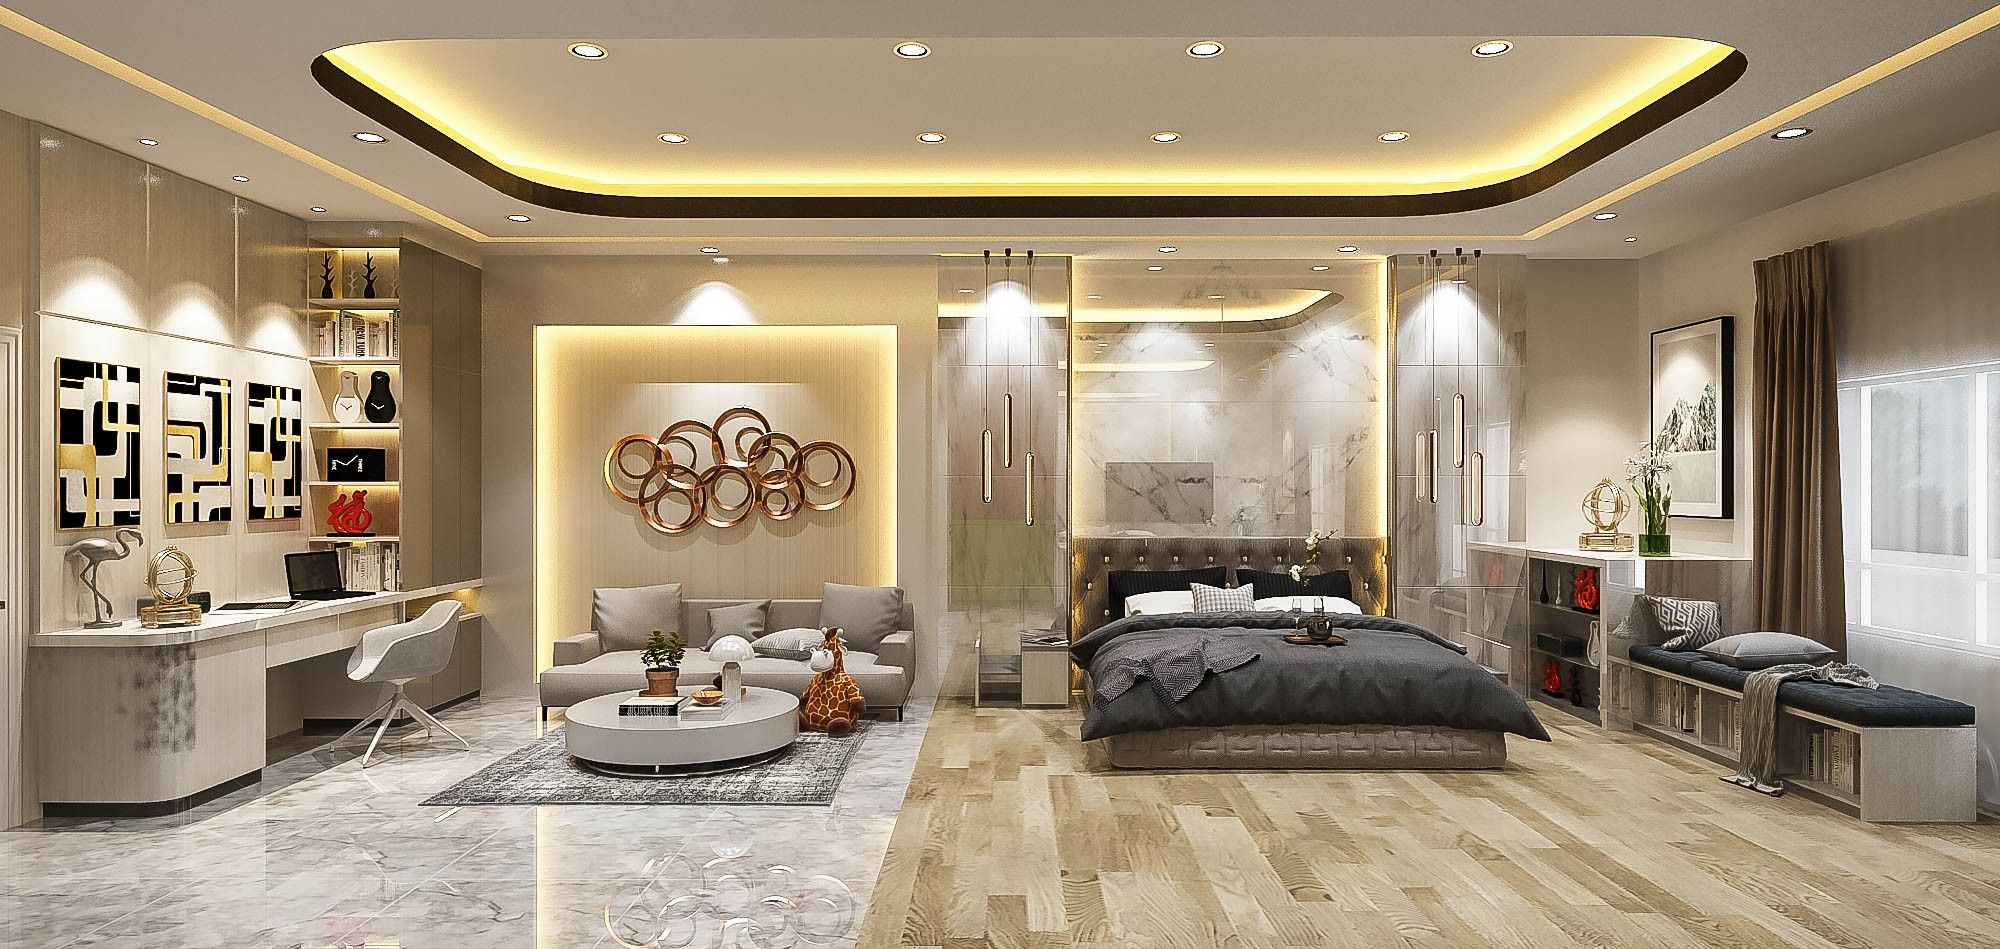 Master Bedroom Design Elegant Luxury White Theme Kamar Mewah Kamar Tidur Mewah Interior Rumah Mewah Elegant luxury room design